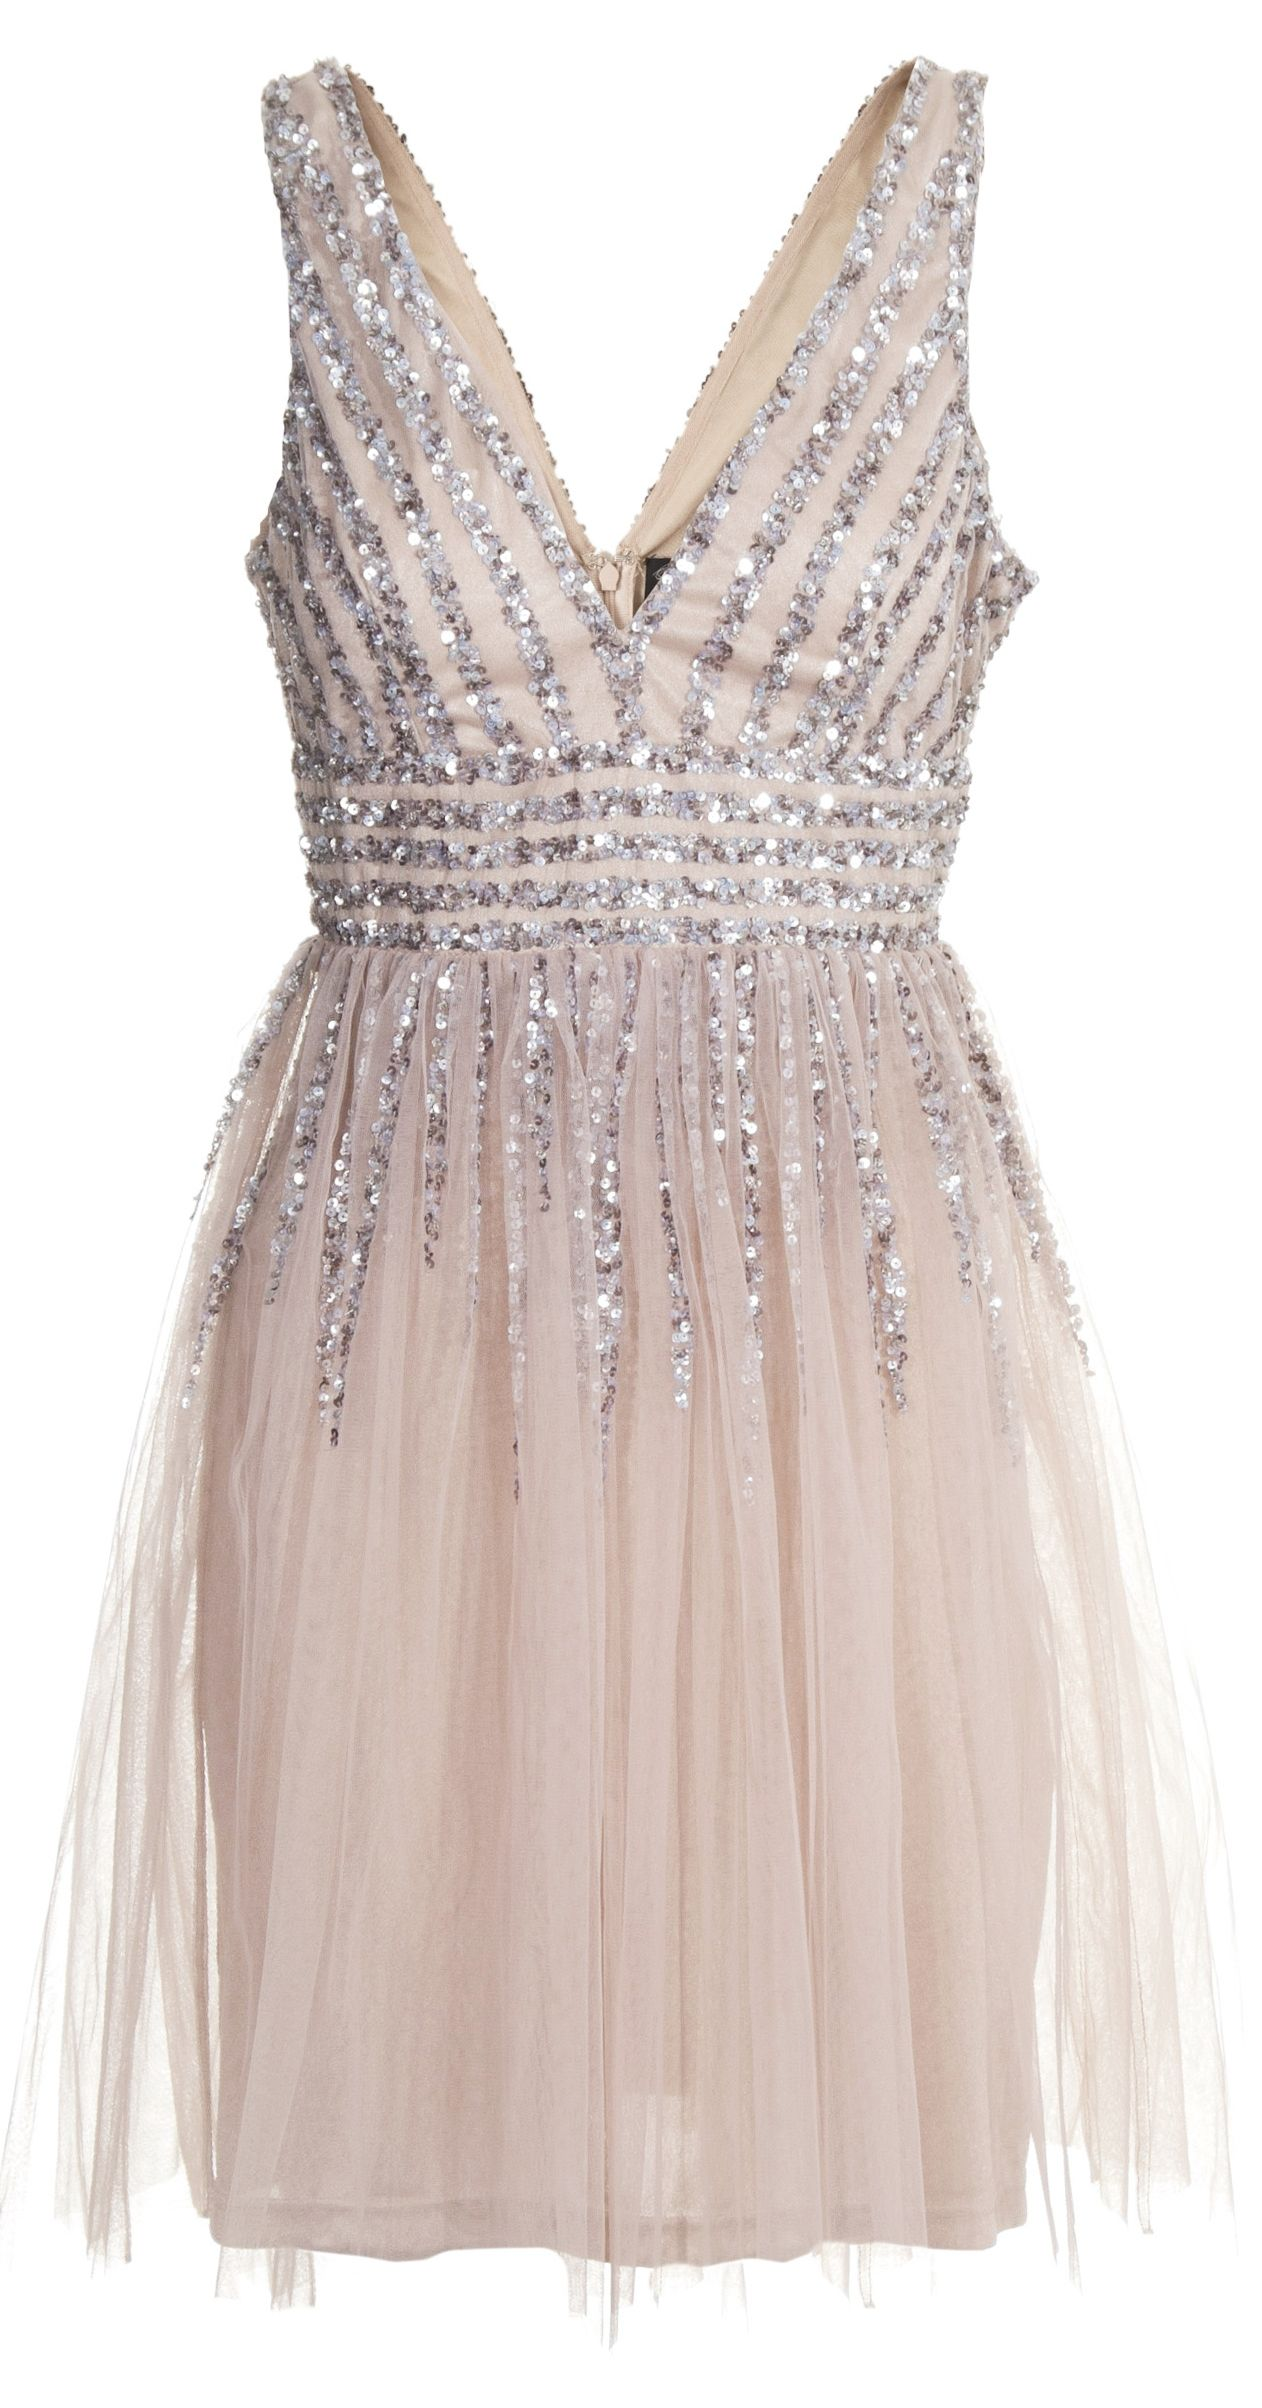 Pin On Dresses I Adore